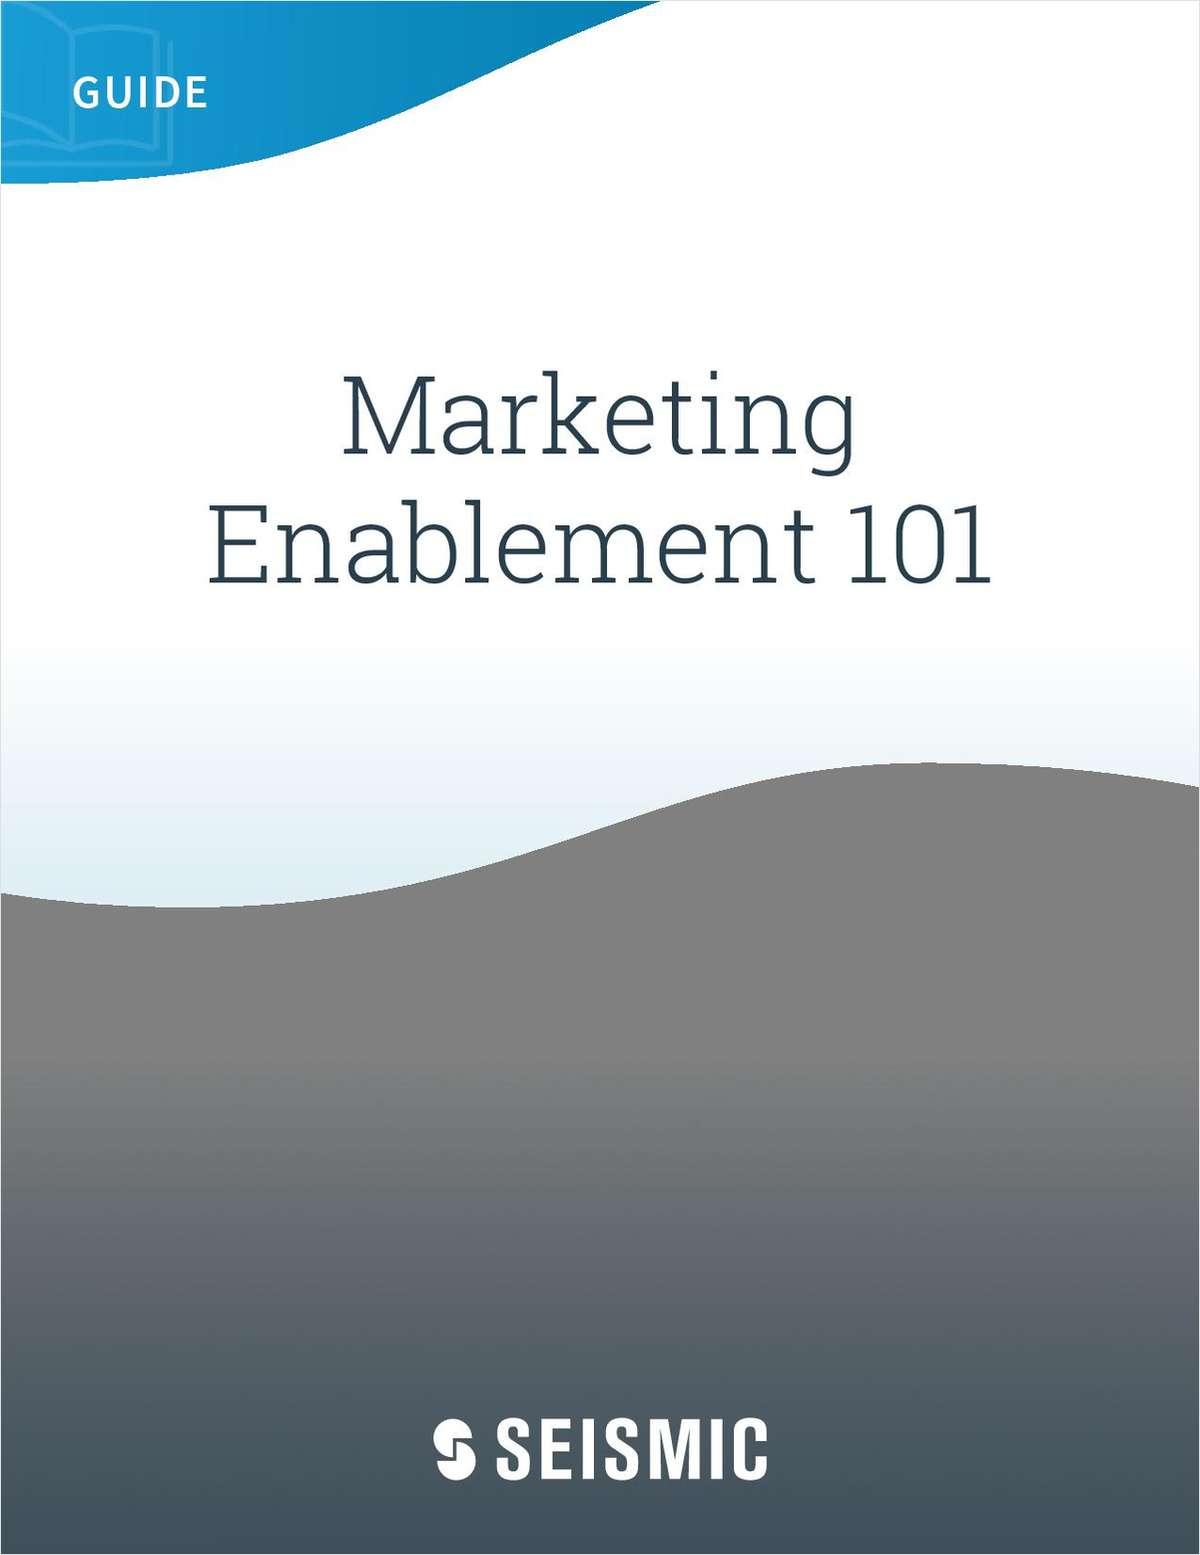 Marketing Enablement 101